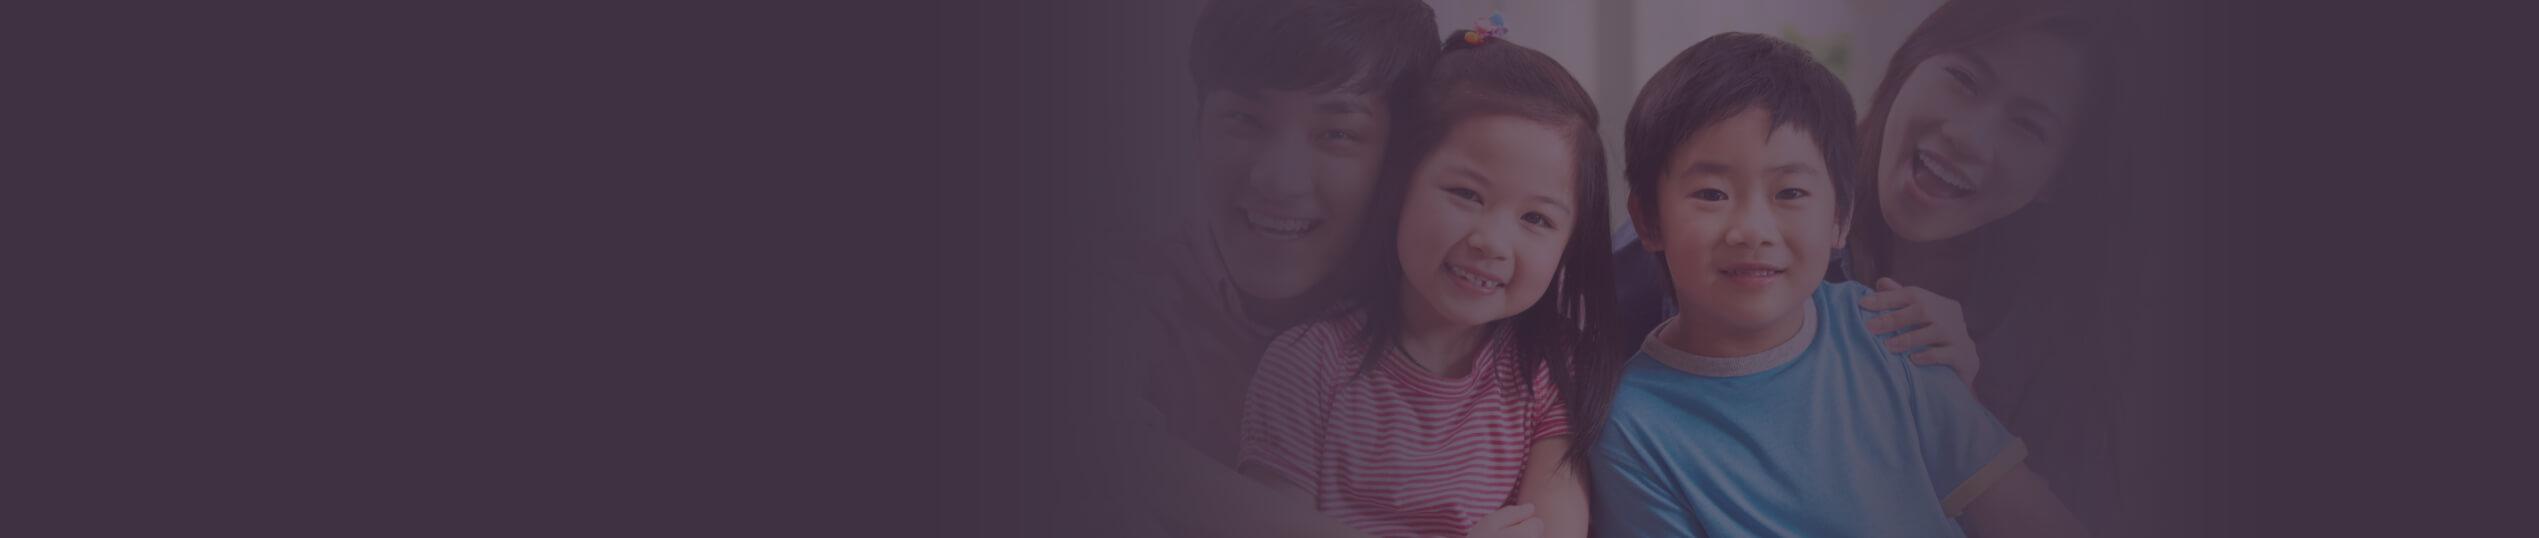 pediatric dentistry background